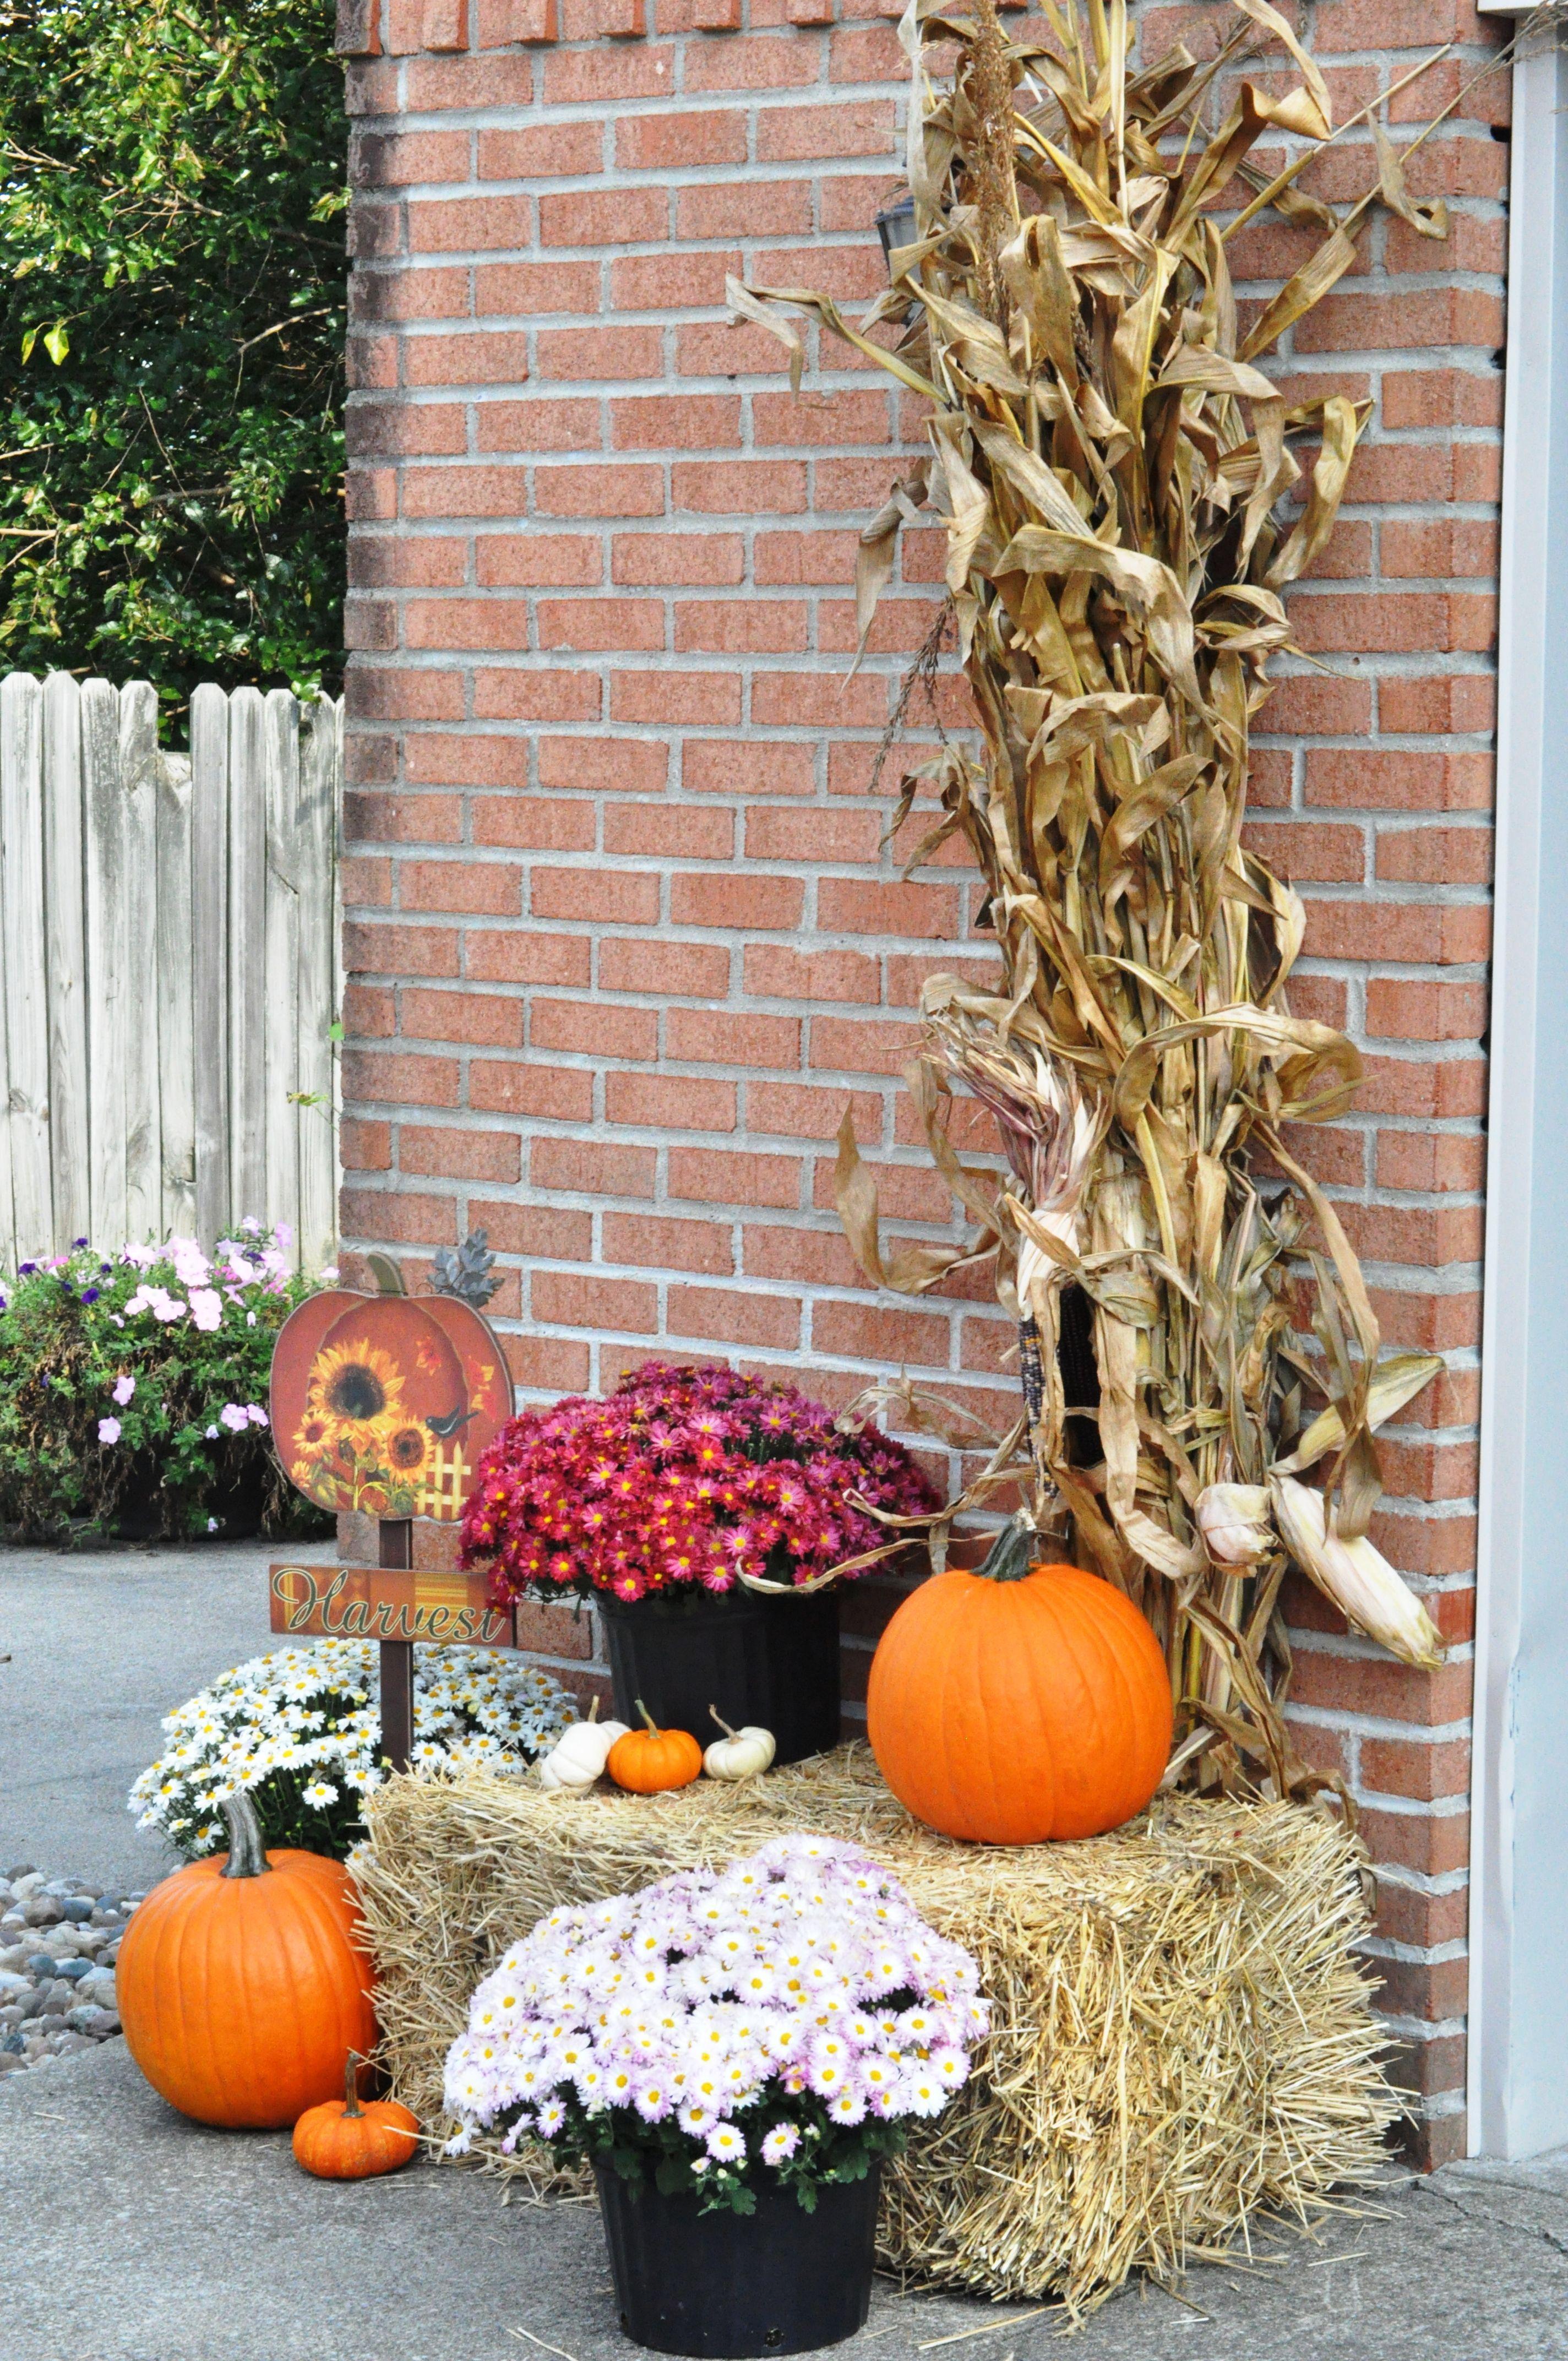 Outdoor Fall Decor Mums Hay Bale Pumpkins Harvest Sign Fall Outdoor Decor Outdoor Christmas Decorations Fall Decor